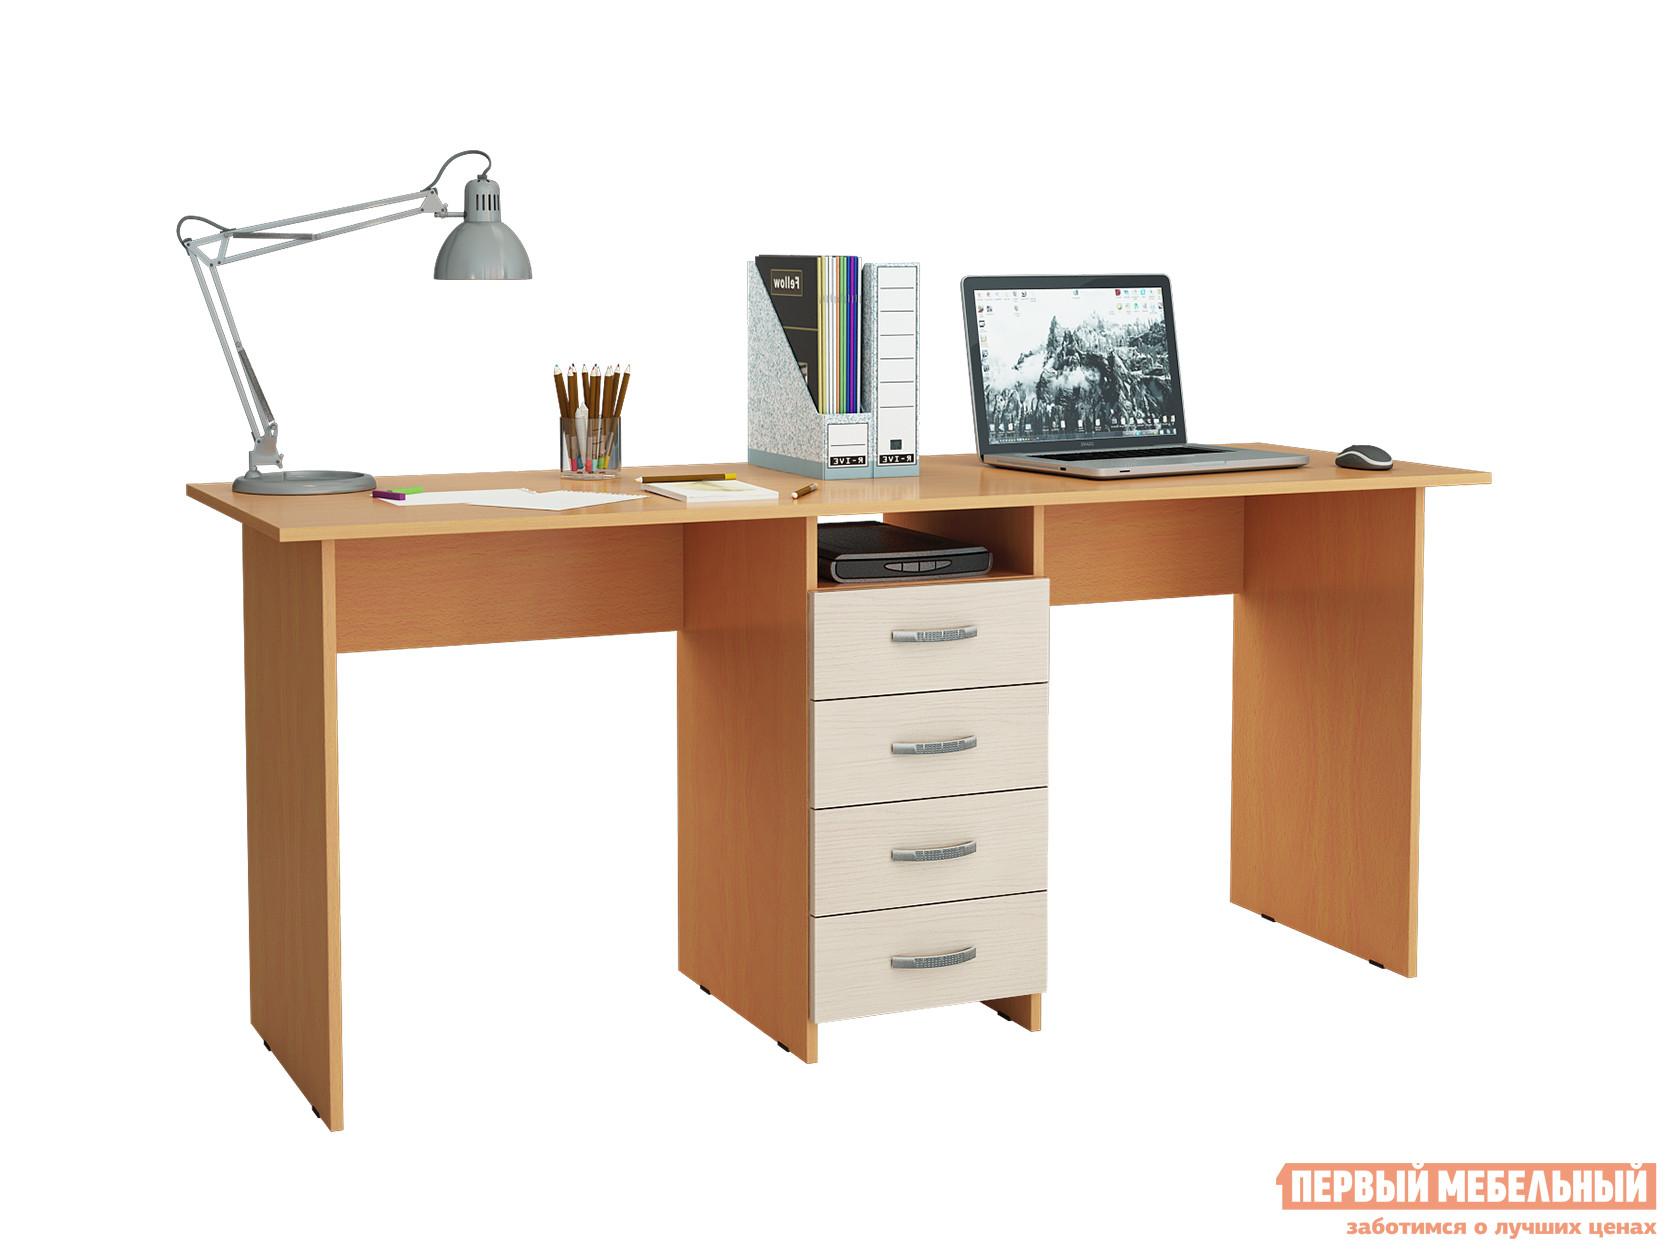 Компьютерный стол МФ Мастер Тандем-2 Бук / Дуб молочный